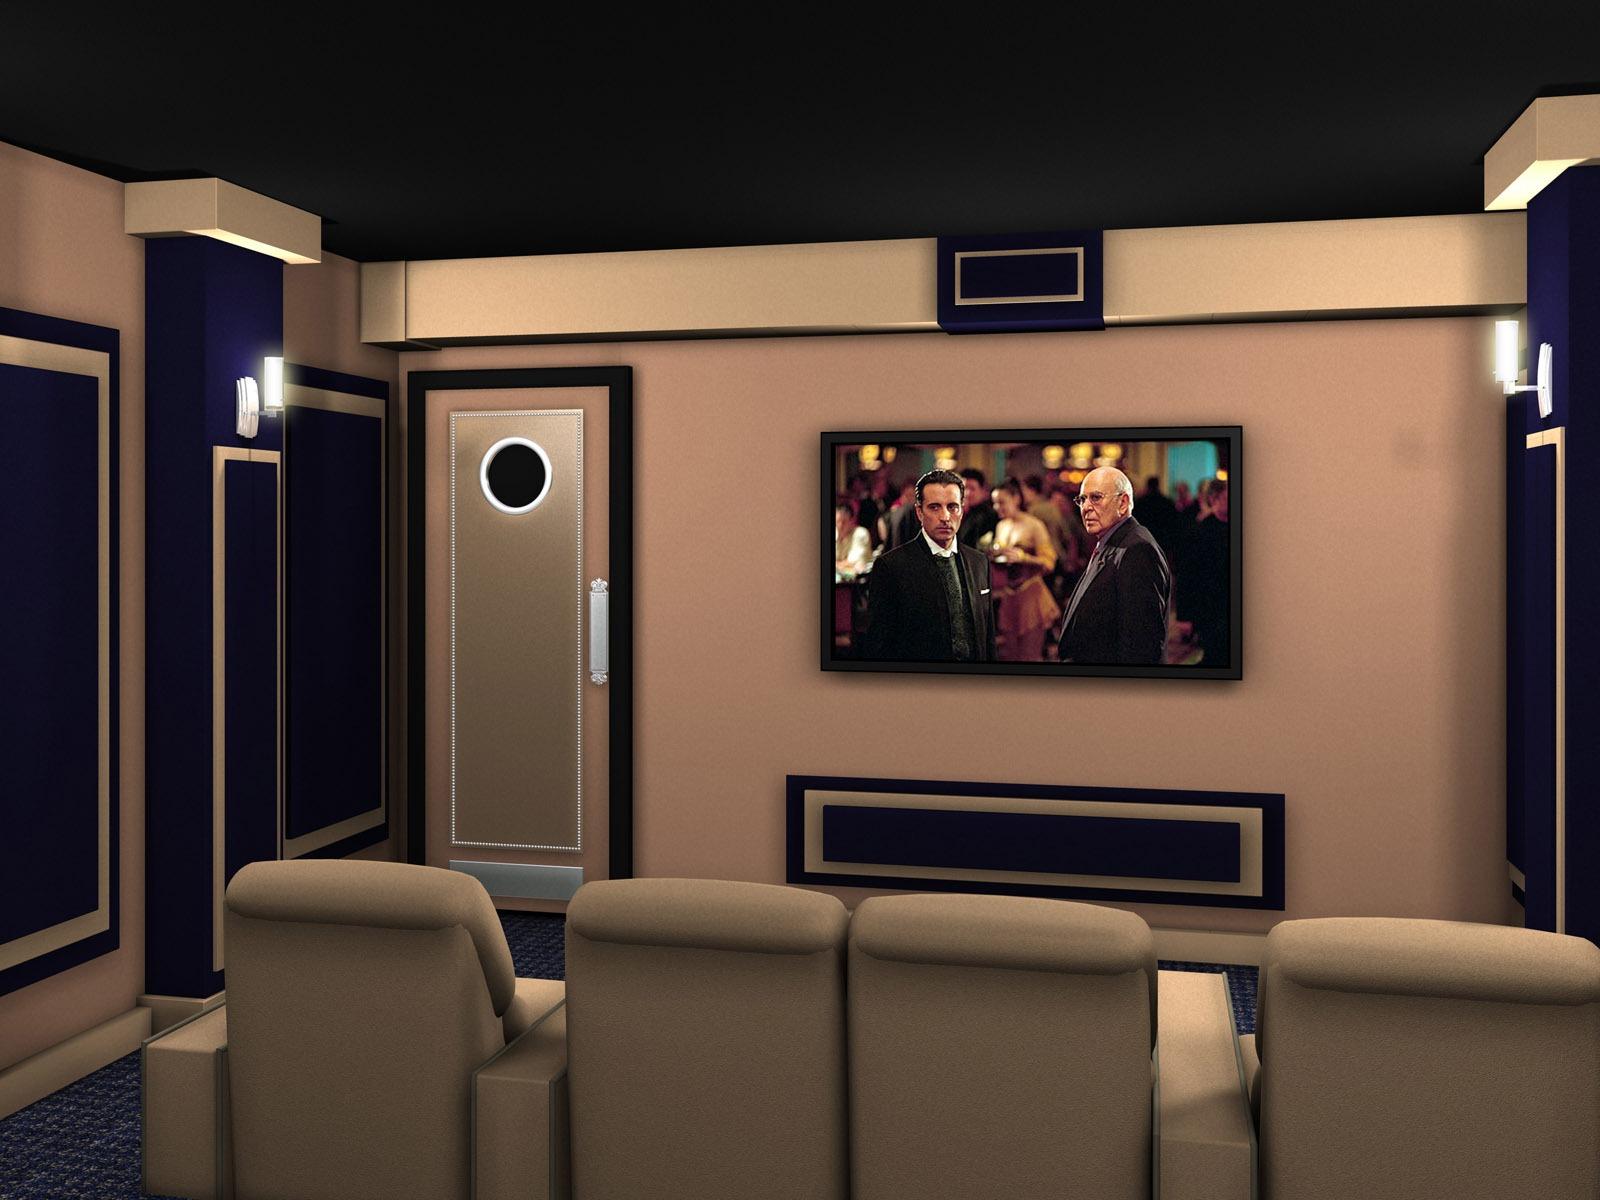 Fondo de pantalla de cine en casa (1) #17 - 1600x1200 Fondos de ...